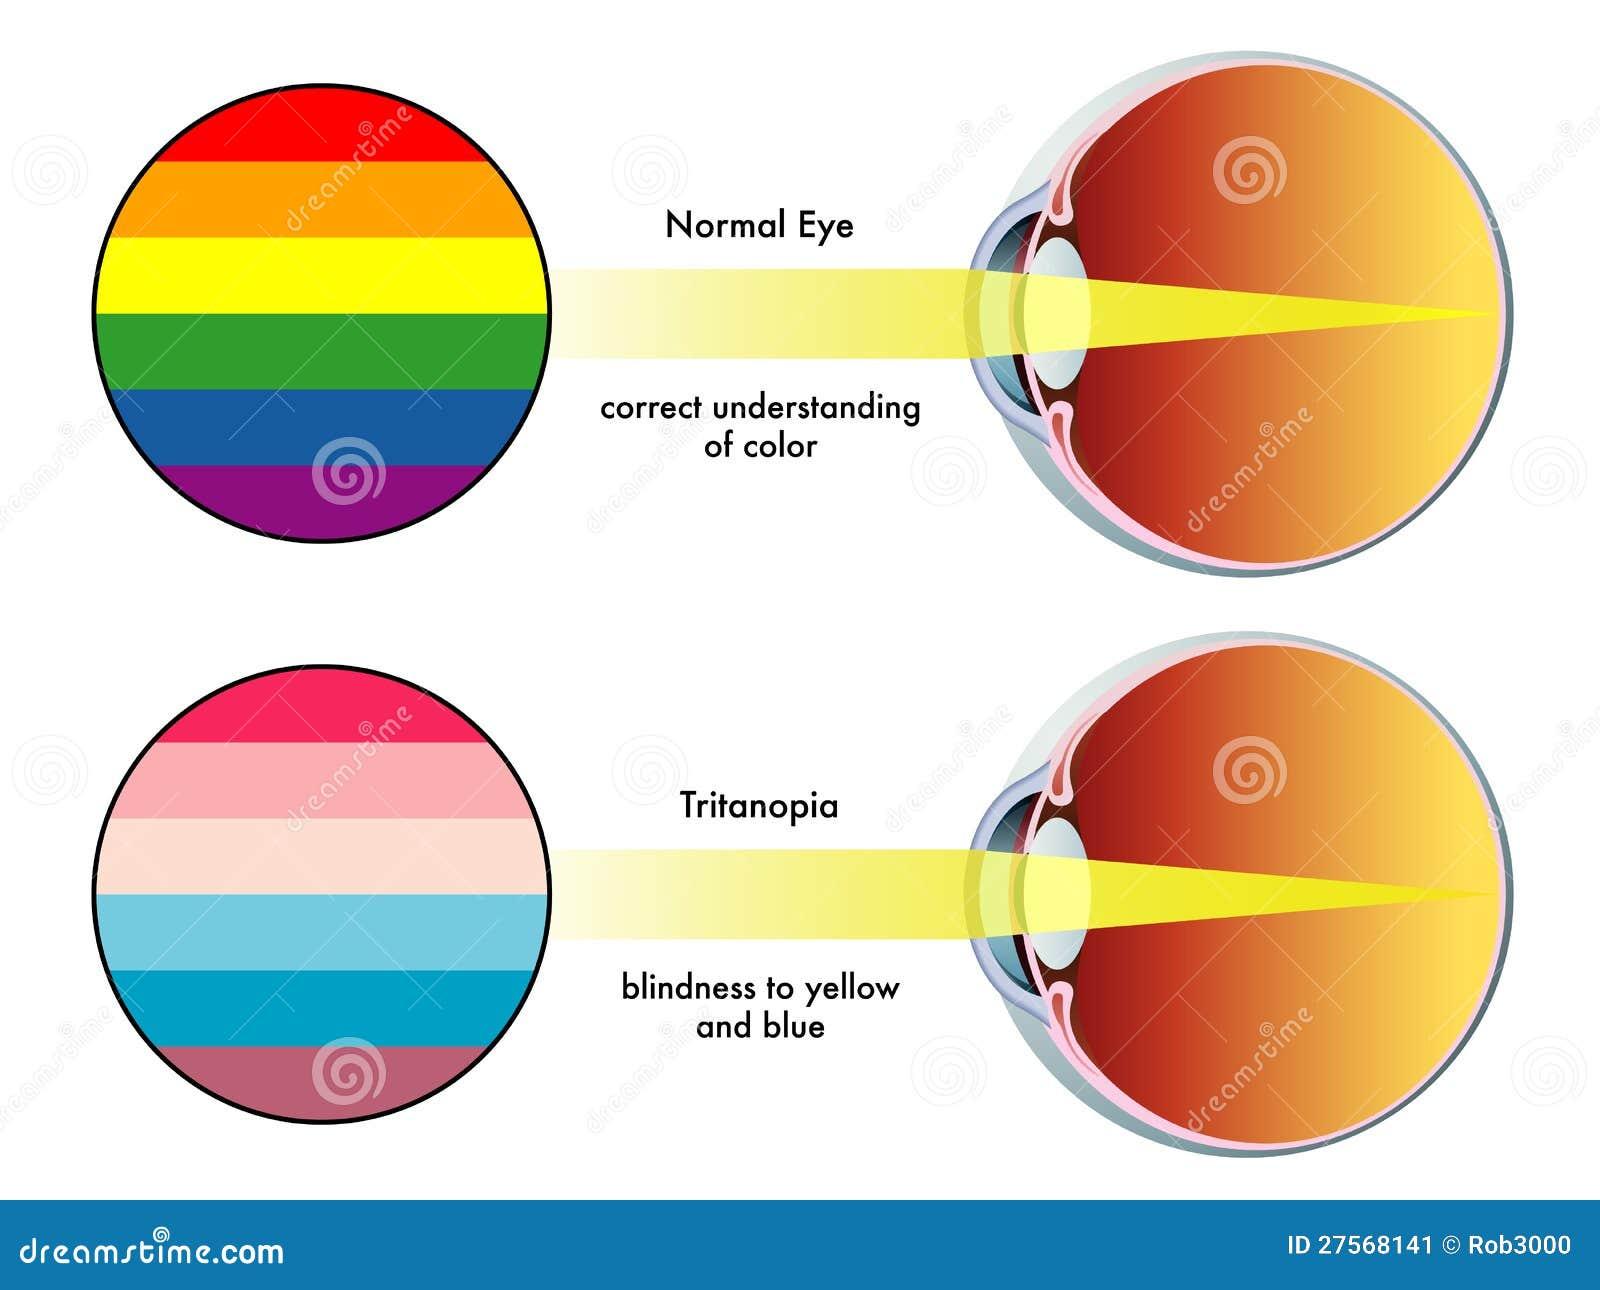 Medical illustration of the symptoms of tritanopia.